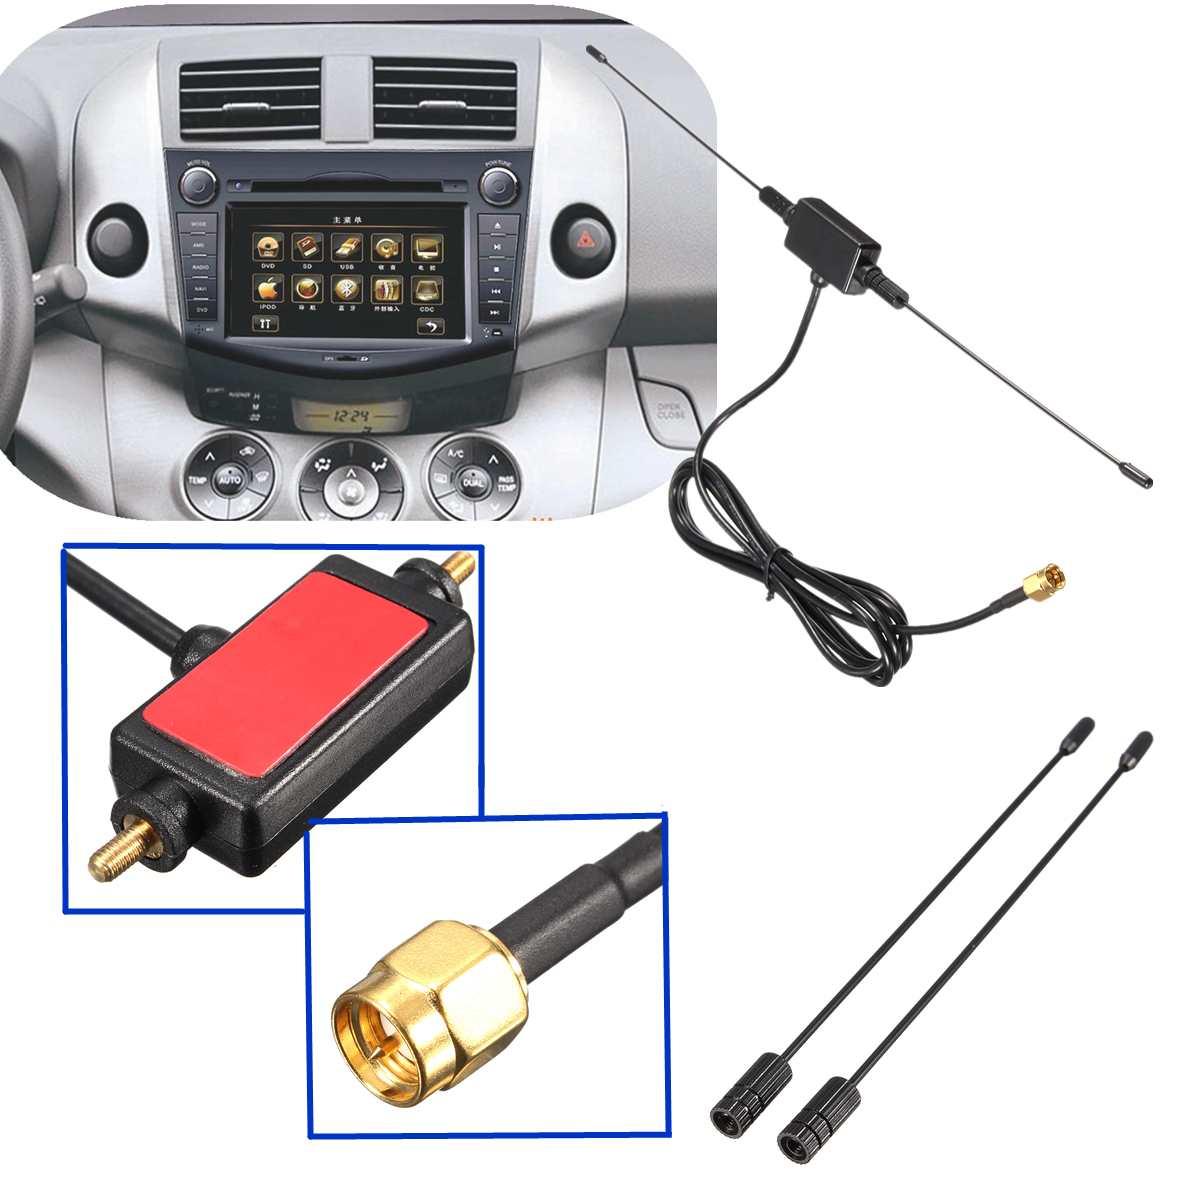 Universal Car Digital TV Antenna 5ft In Car Radio Digital DVB-T ISDB-T TV Signal 6dBi Antenna 433 MHZ Amplifier 10 -